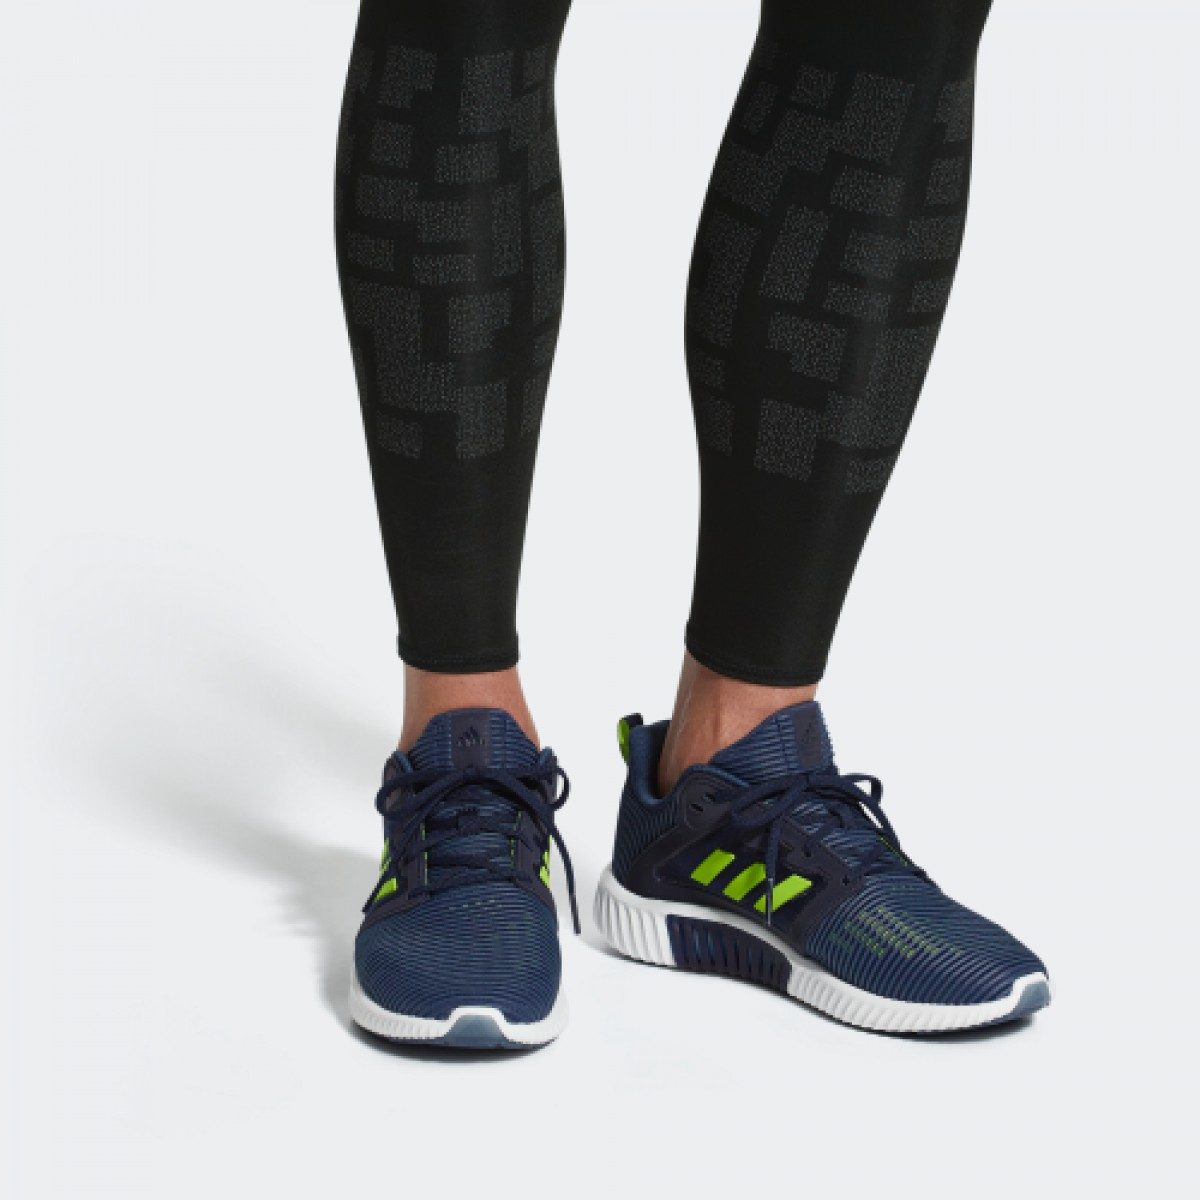 Adidas Climacool Vent M